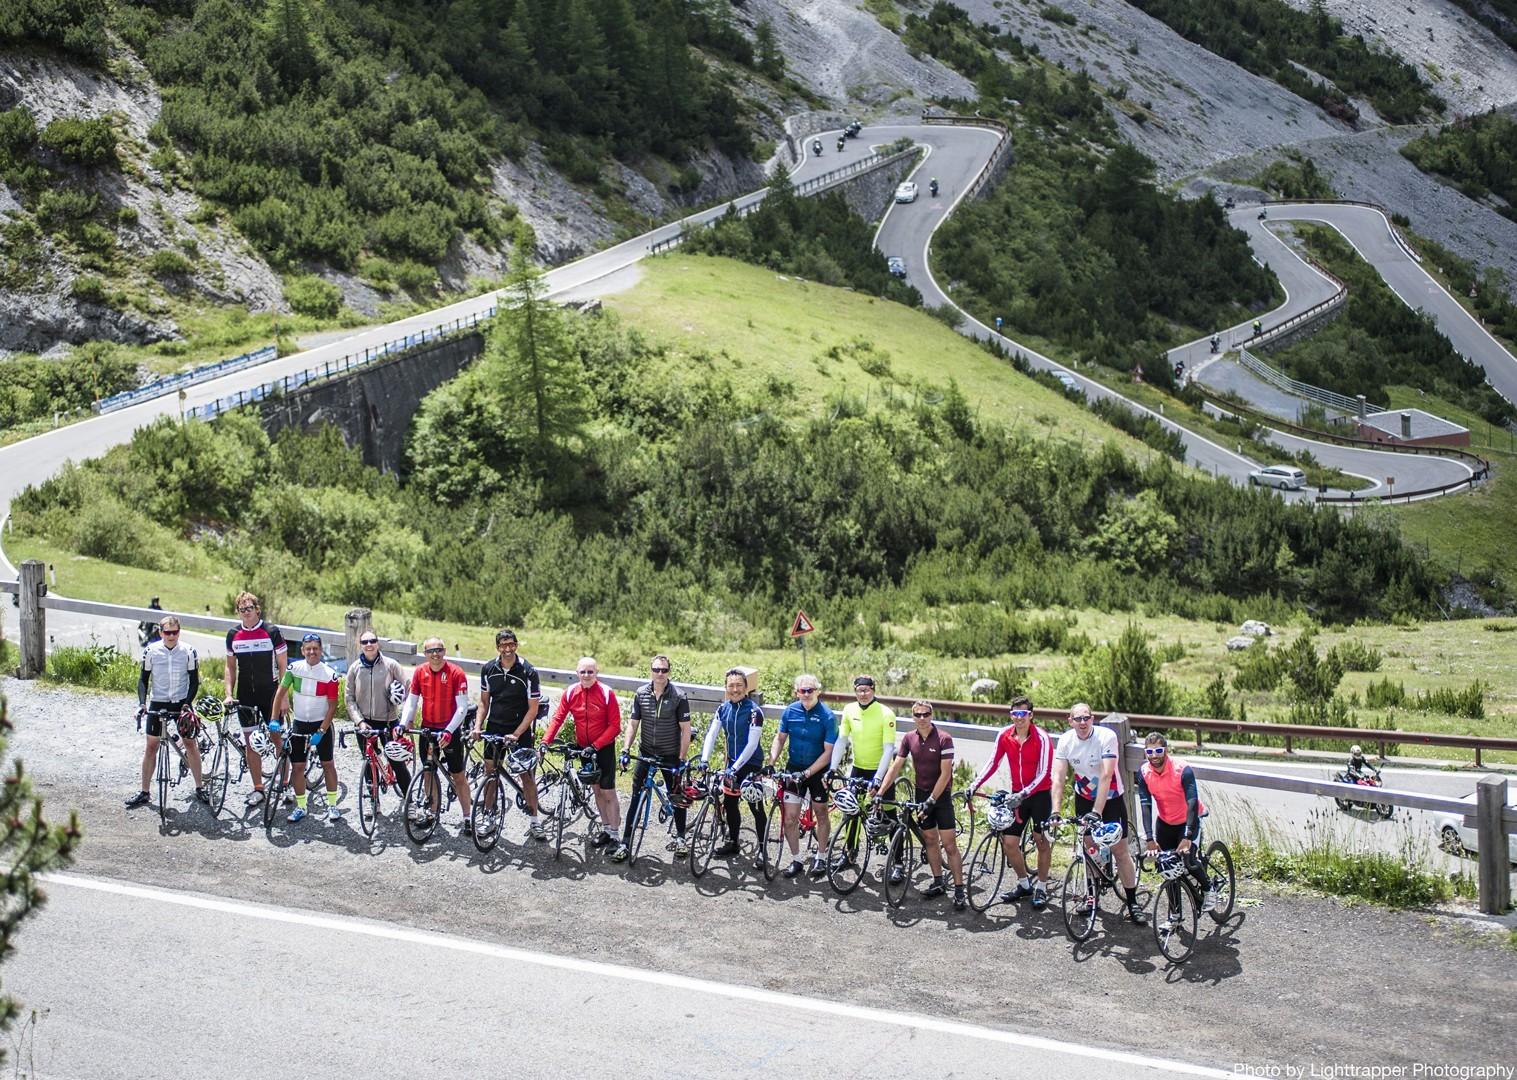 italian-alps-stelvio-guided-road-cycling-holiday.jpg - Italy - Italian Alps - Guided Road Cycling Holiday - Road Cycling